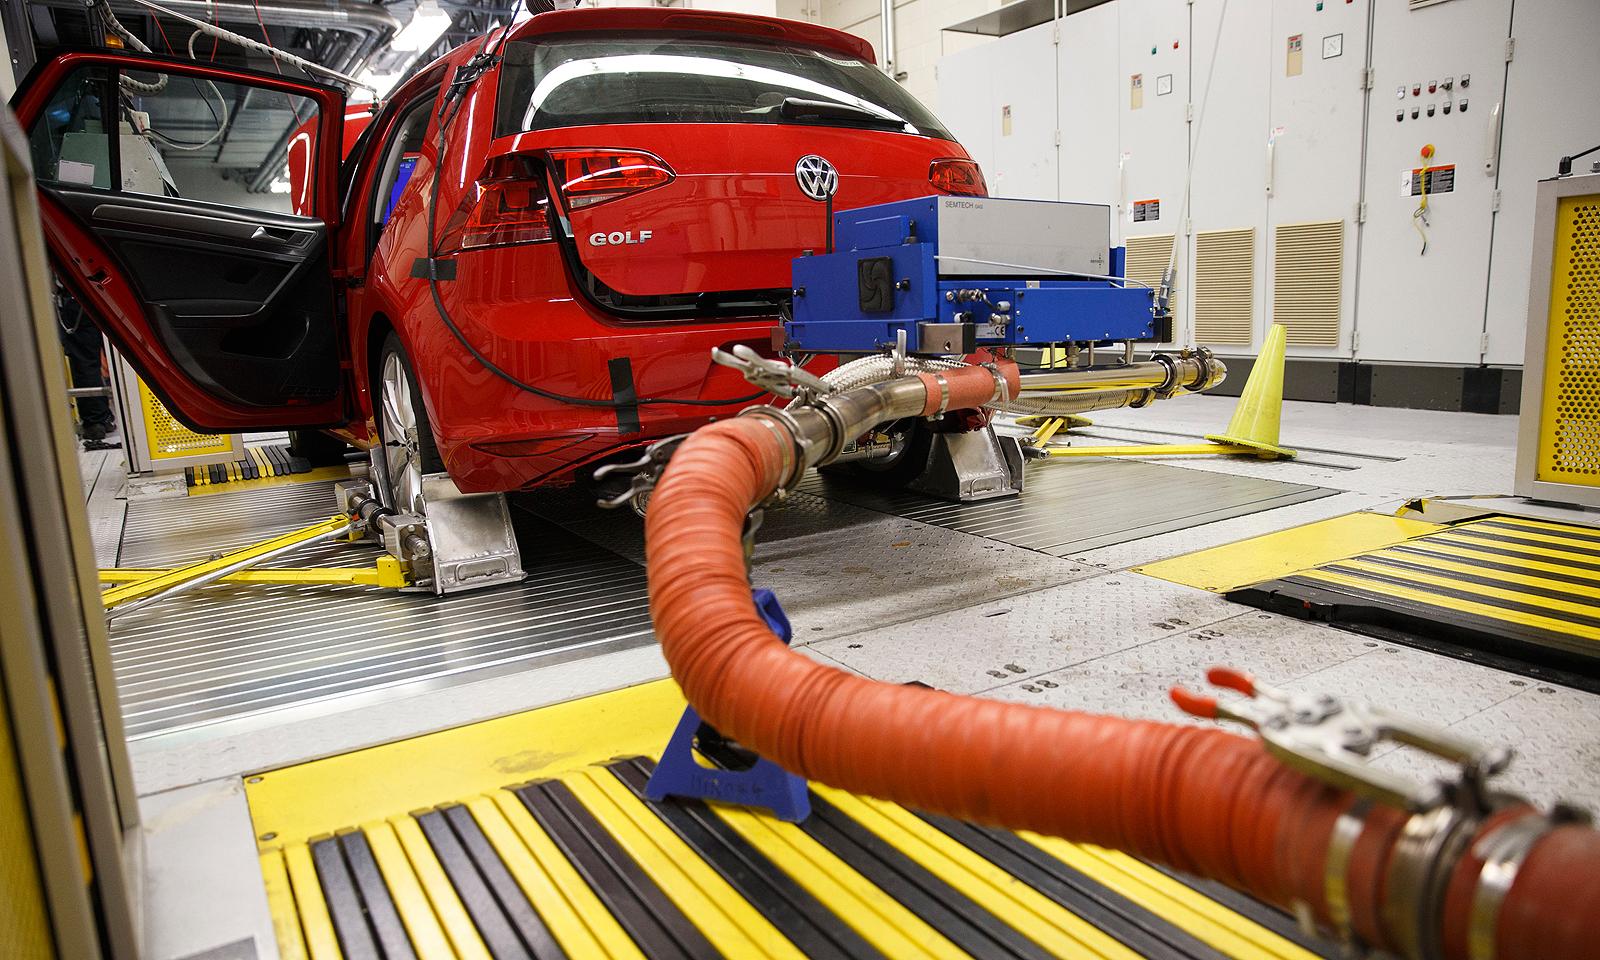 emissions-control software program